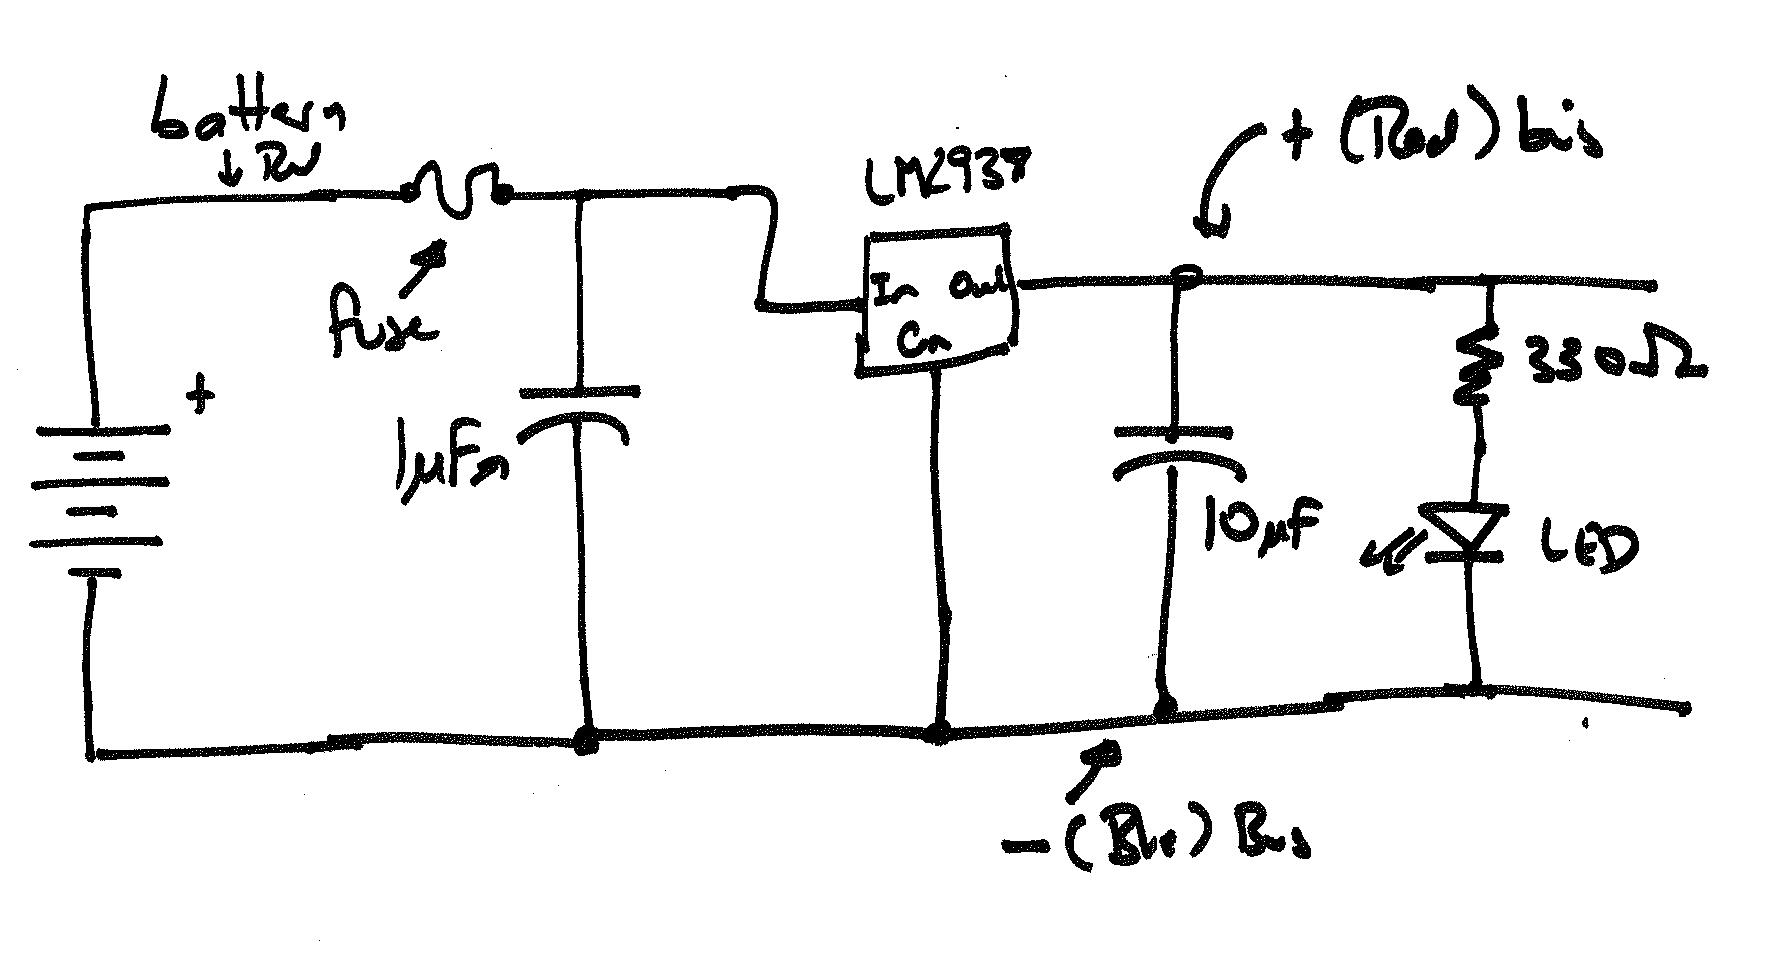 Regulator Schematic Symbol Wiring Diagram For Light Switch